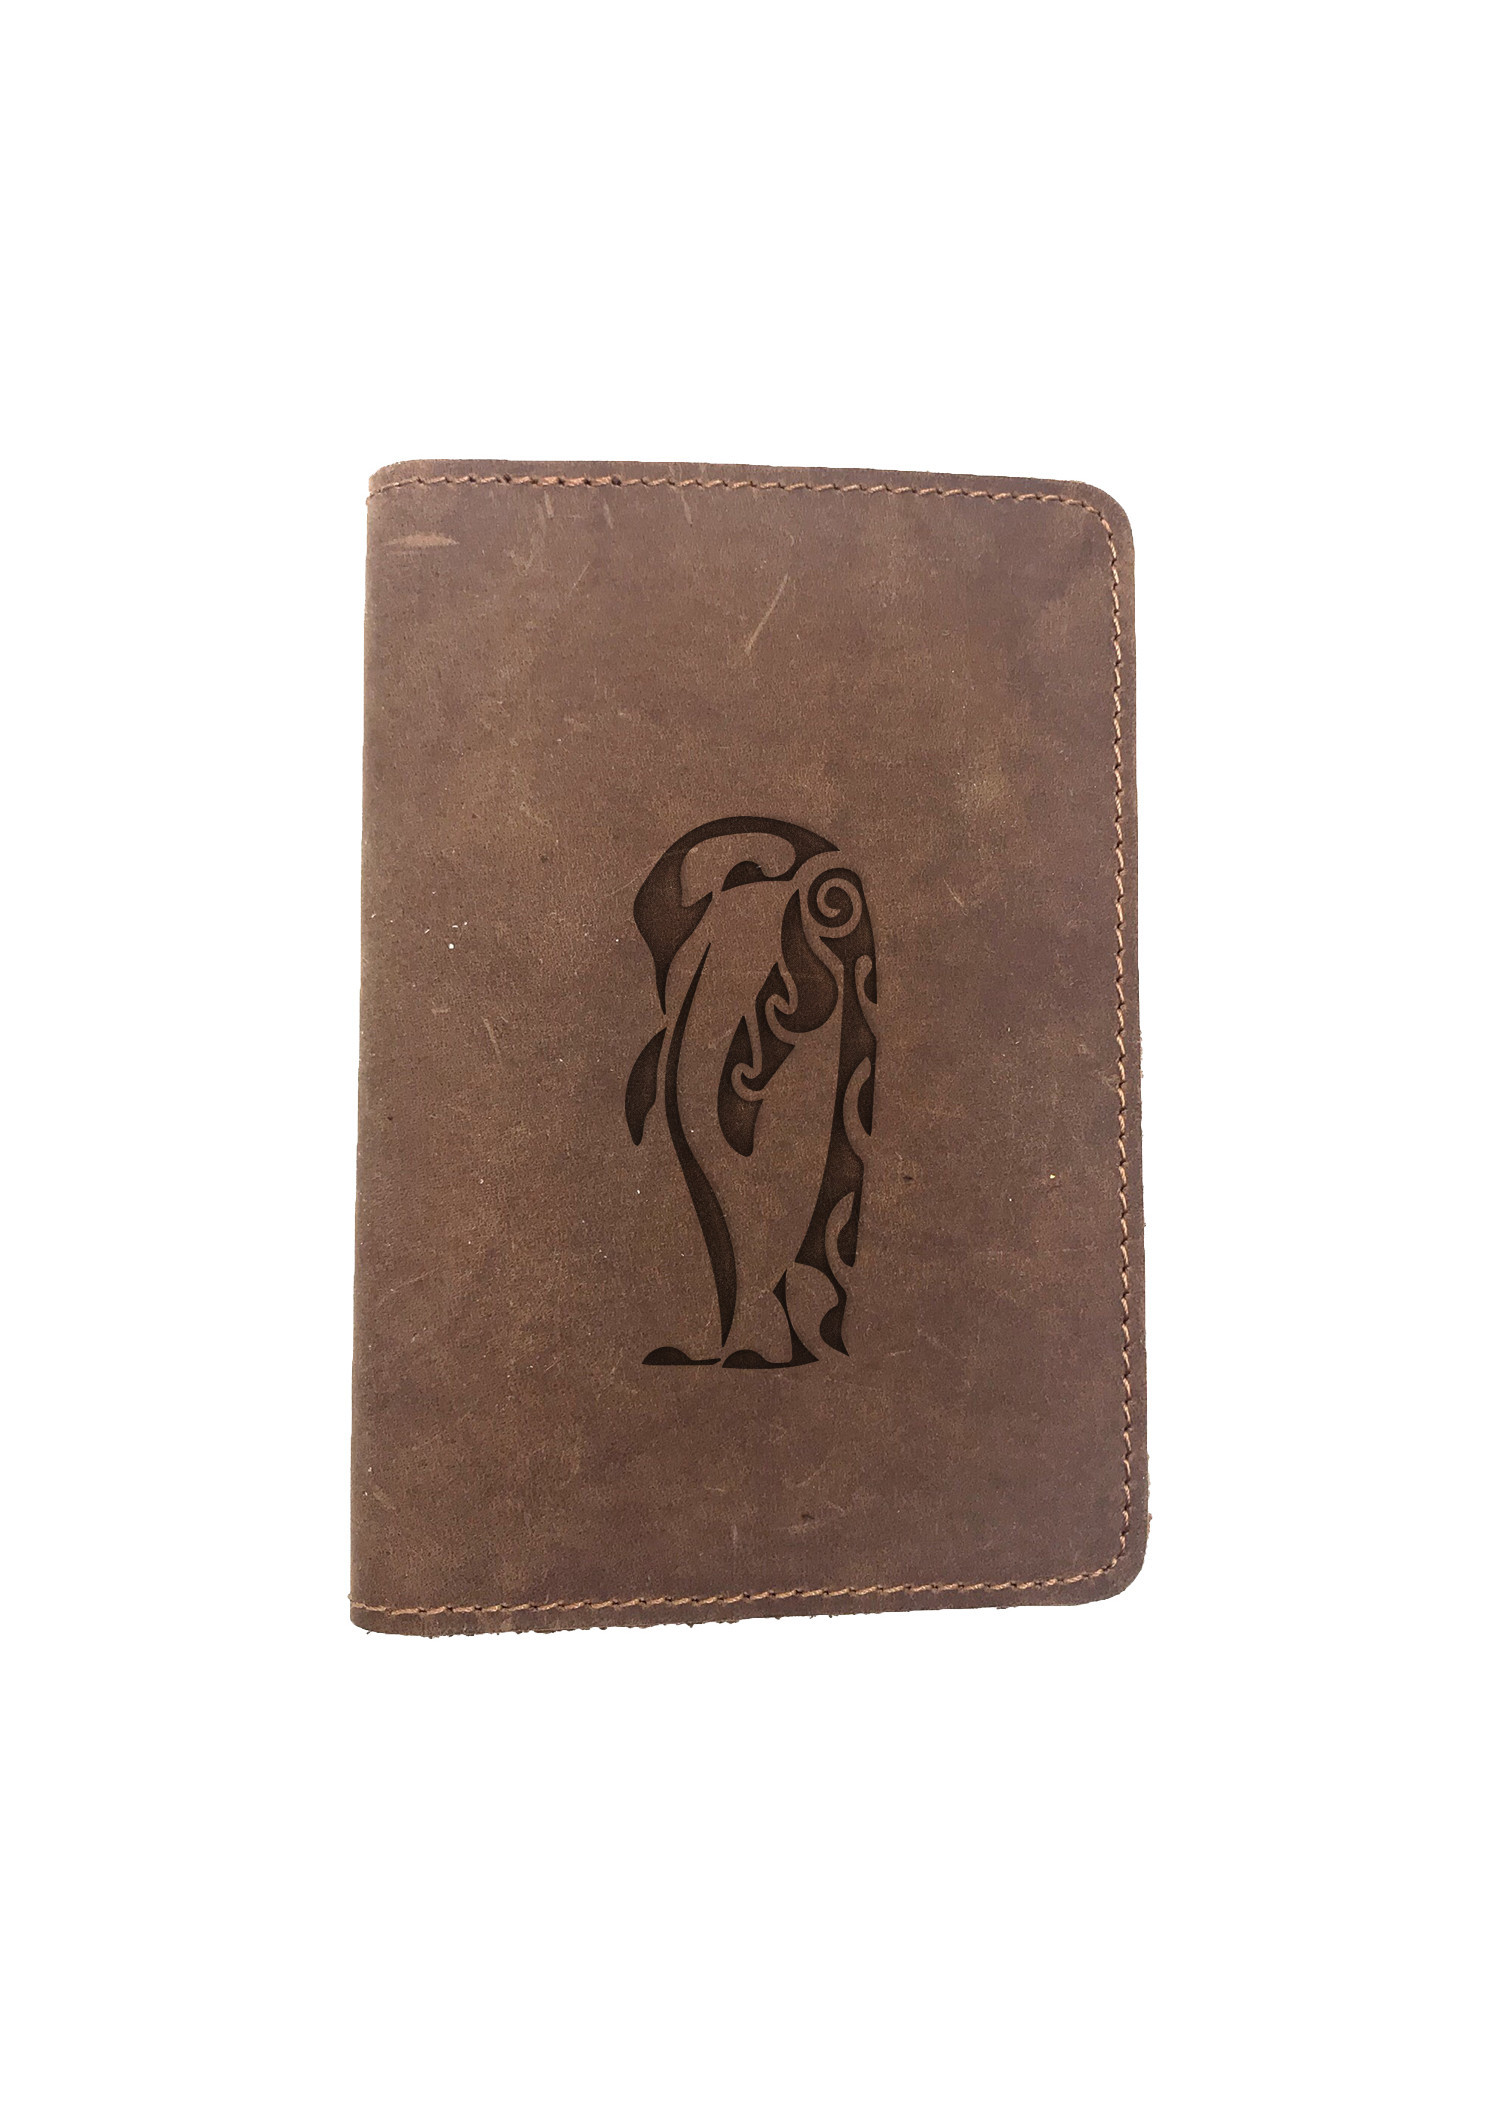 Passport Cover Bao Da Hộ Chiếu Da Sáp Khắc Hình Cánh cụt PENGUIN STENCIL ART (BROWN)